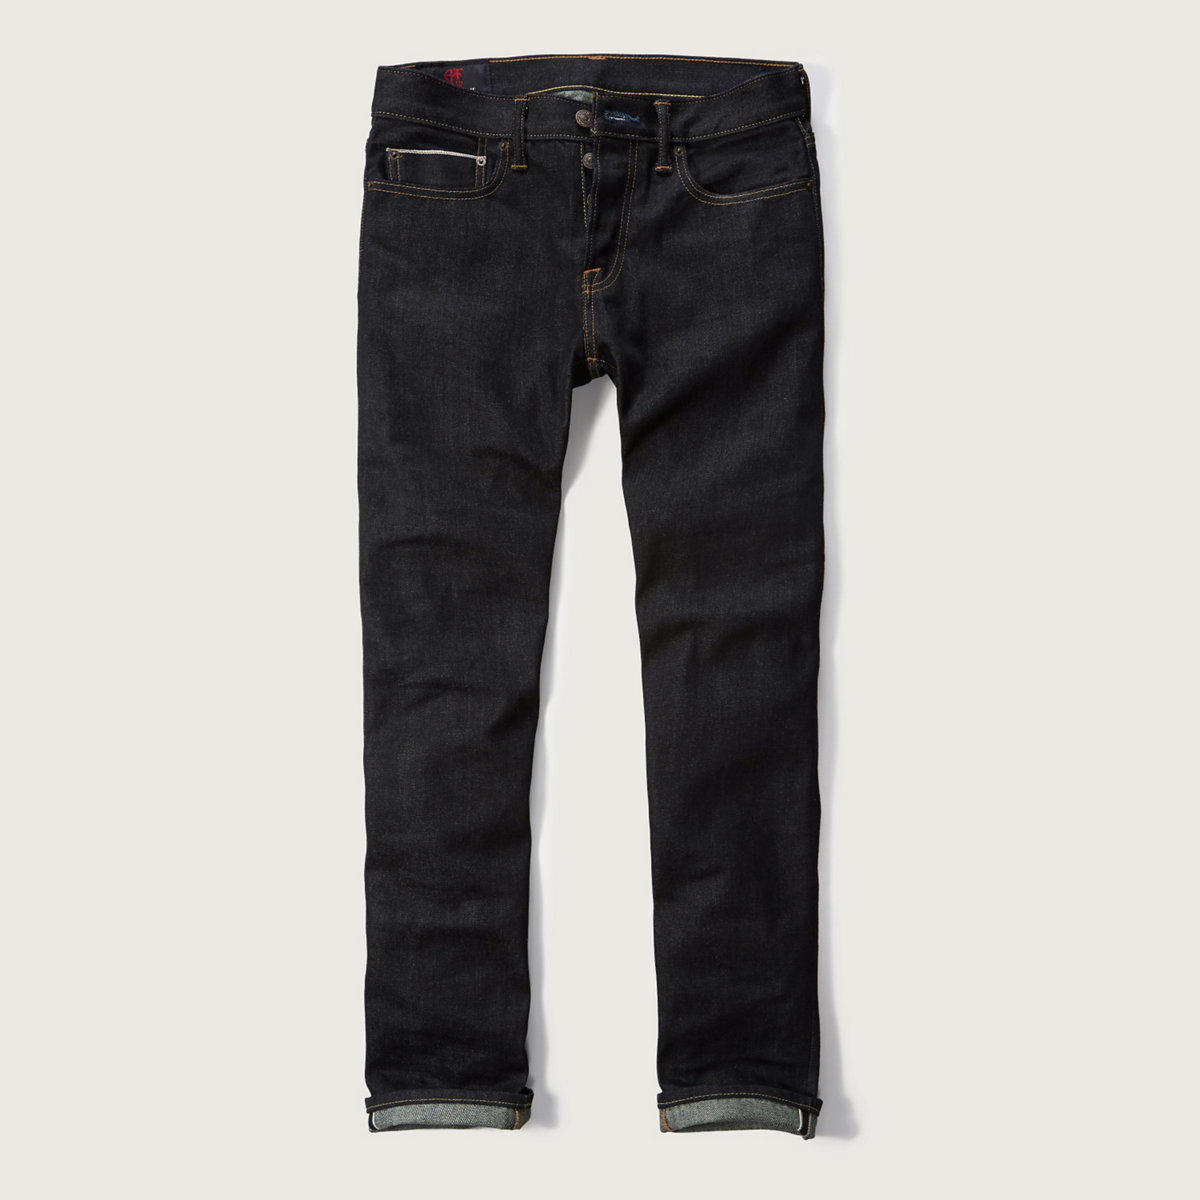 Selvedge Straight Raw Jeans